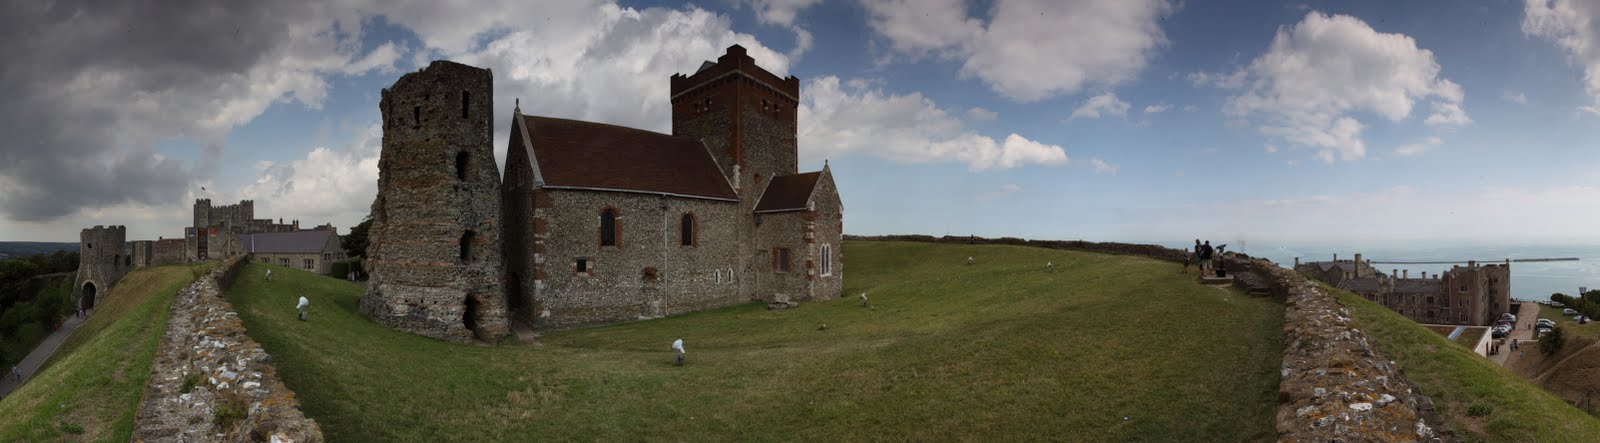 [dover+castle+panorama.jpg]